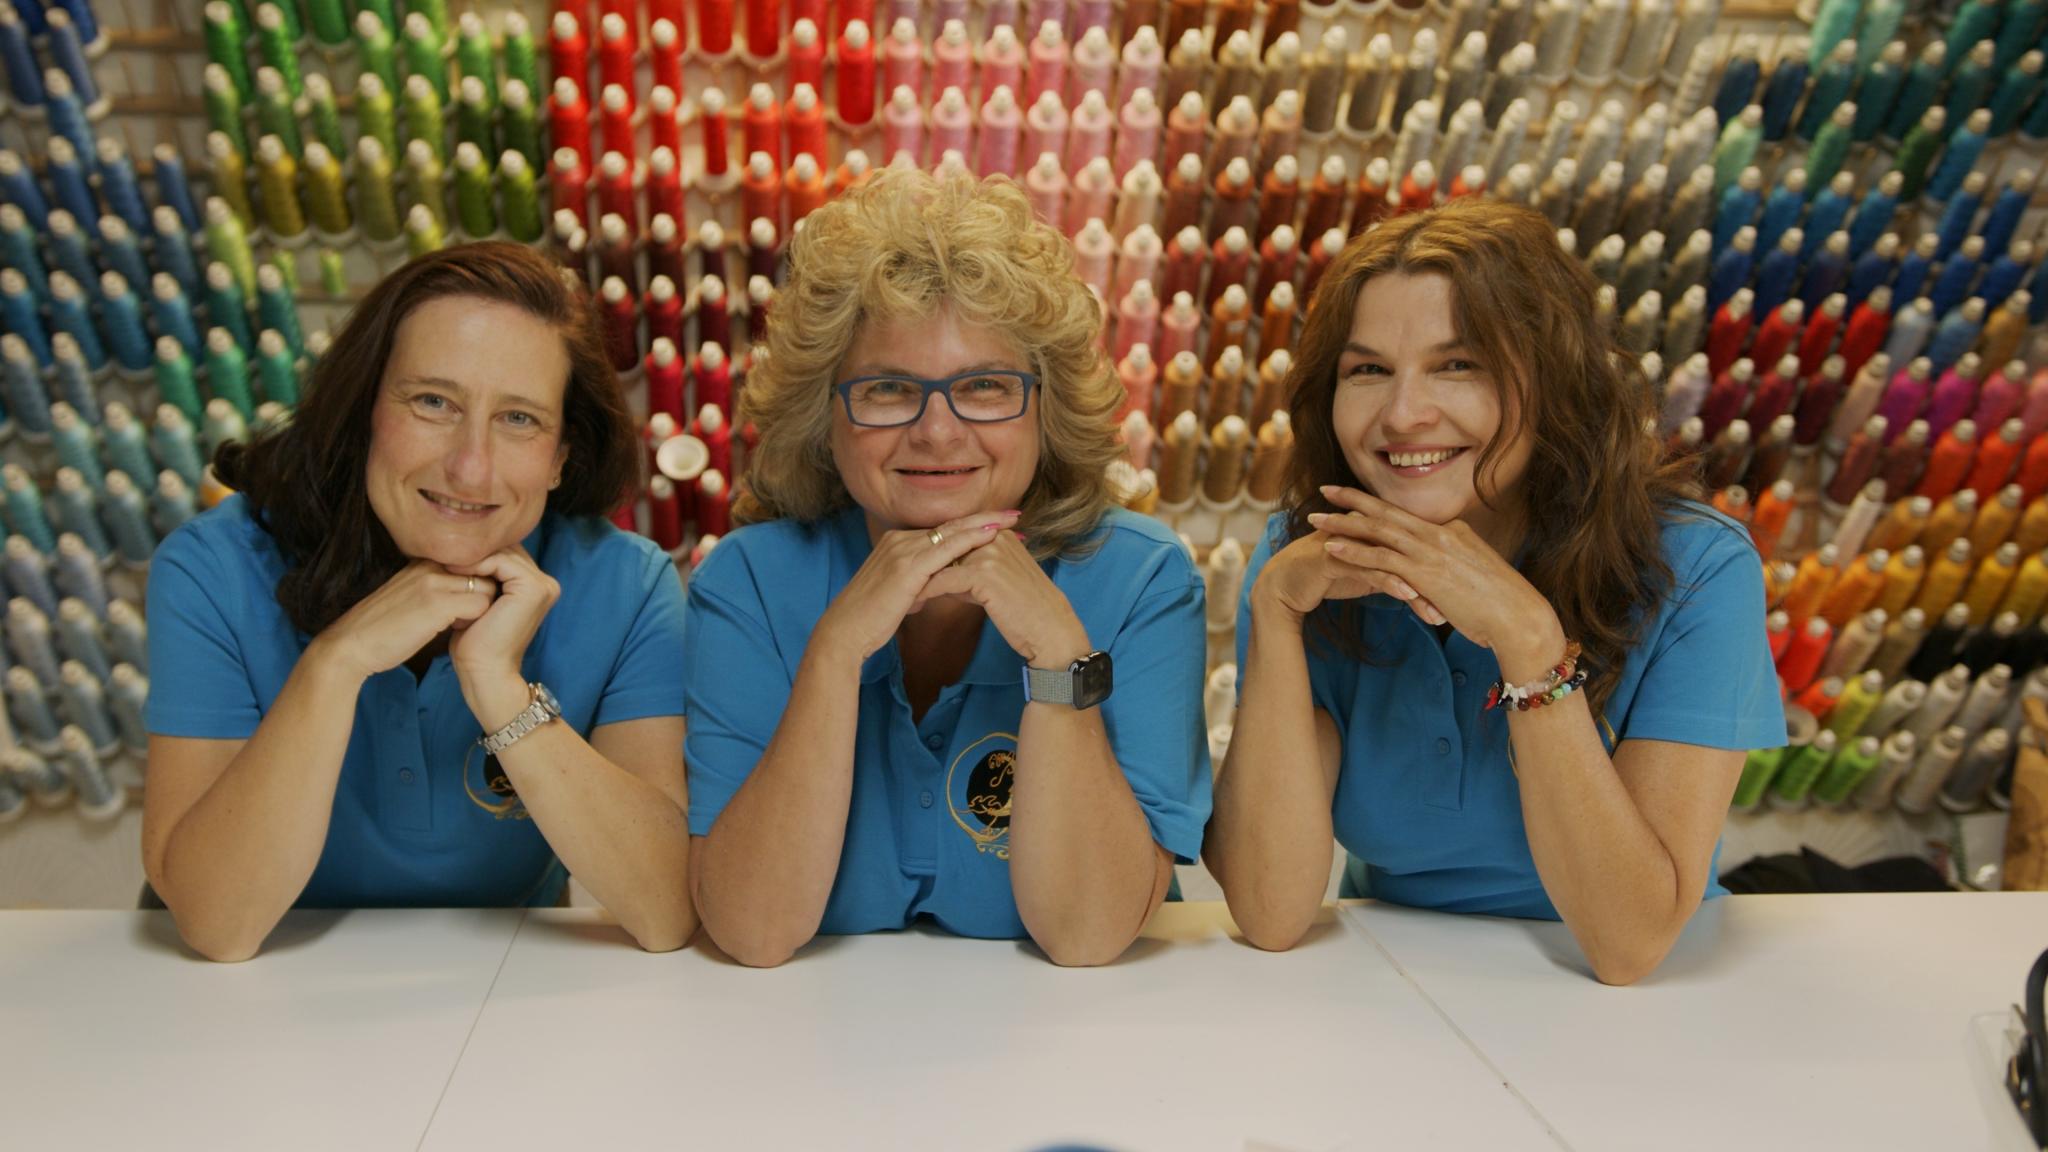 Sticktipp GmbH - Inh. Sylvia Herbig